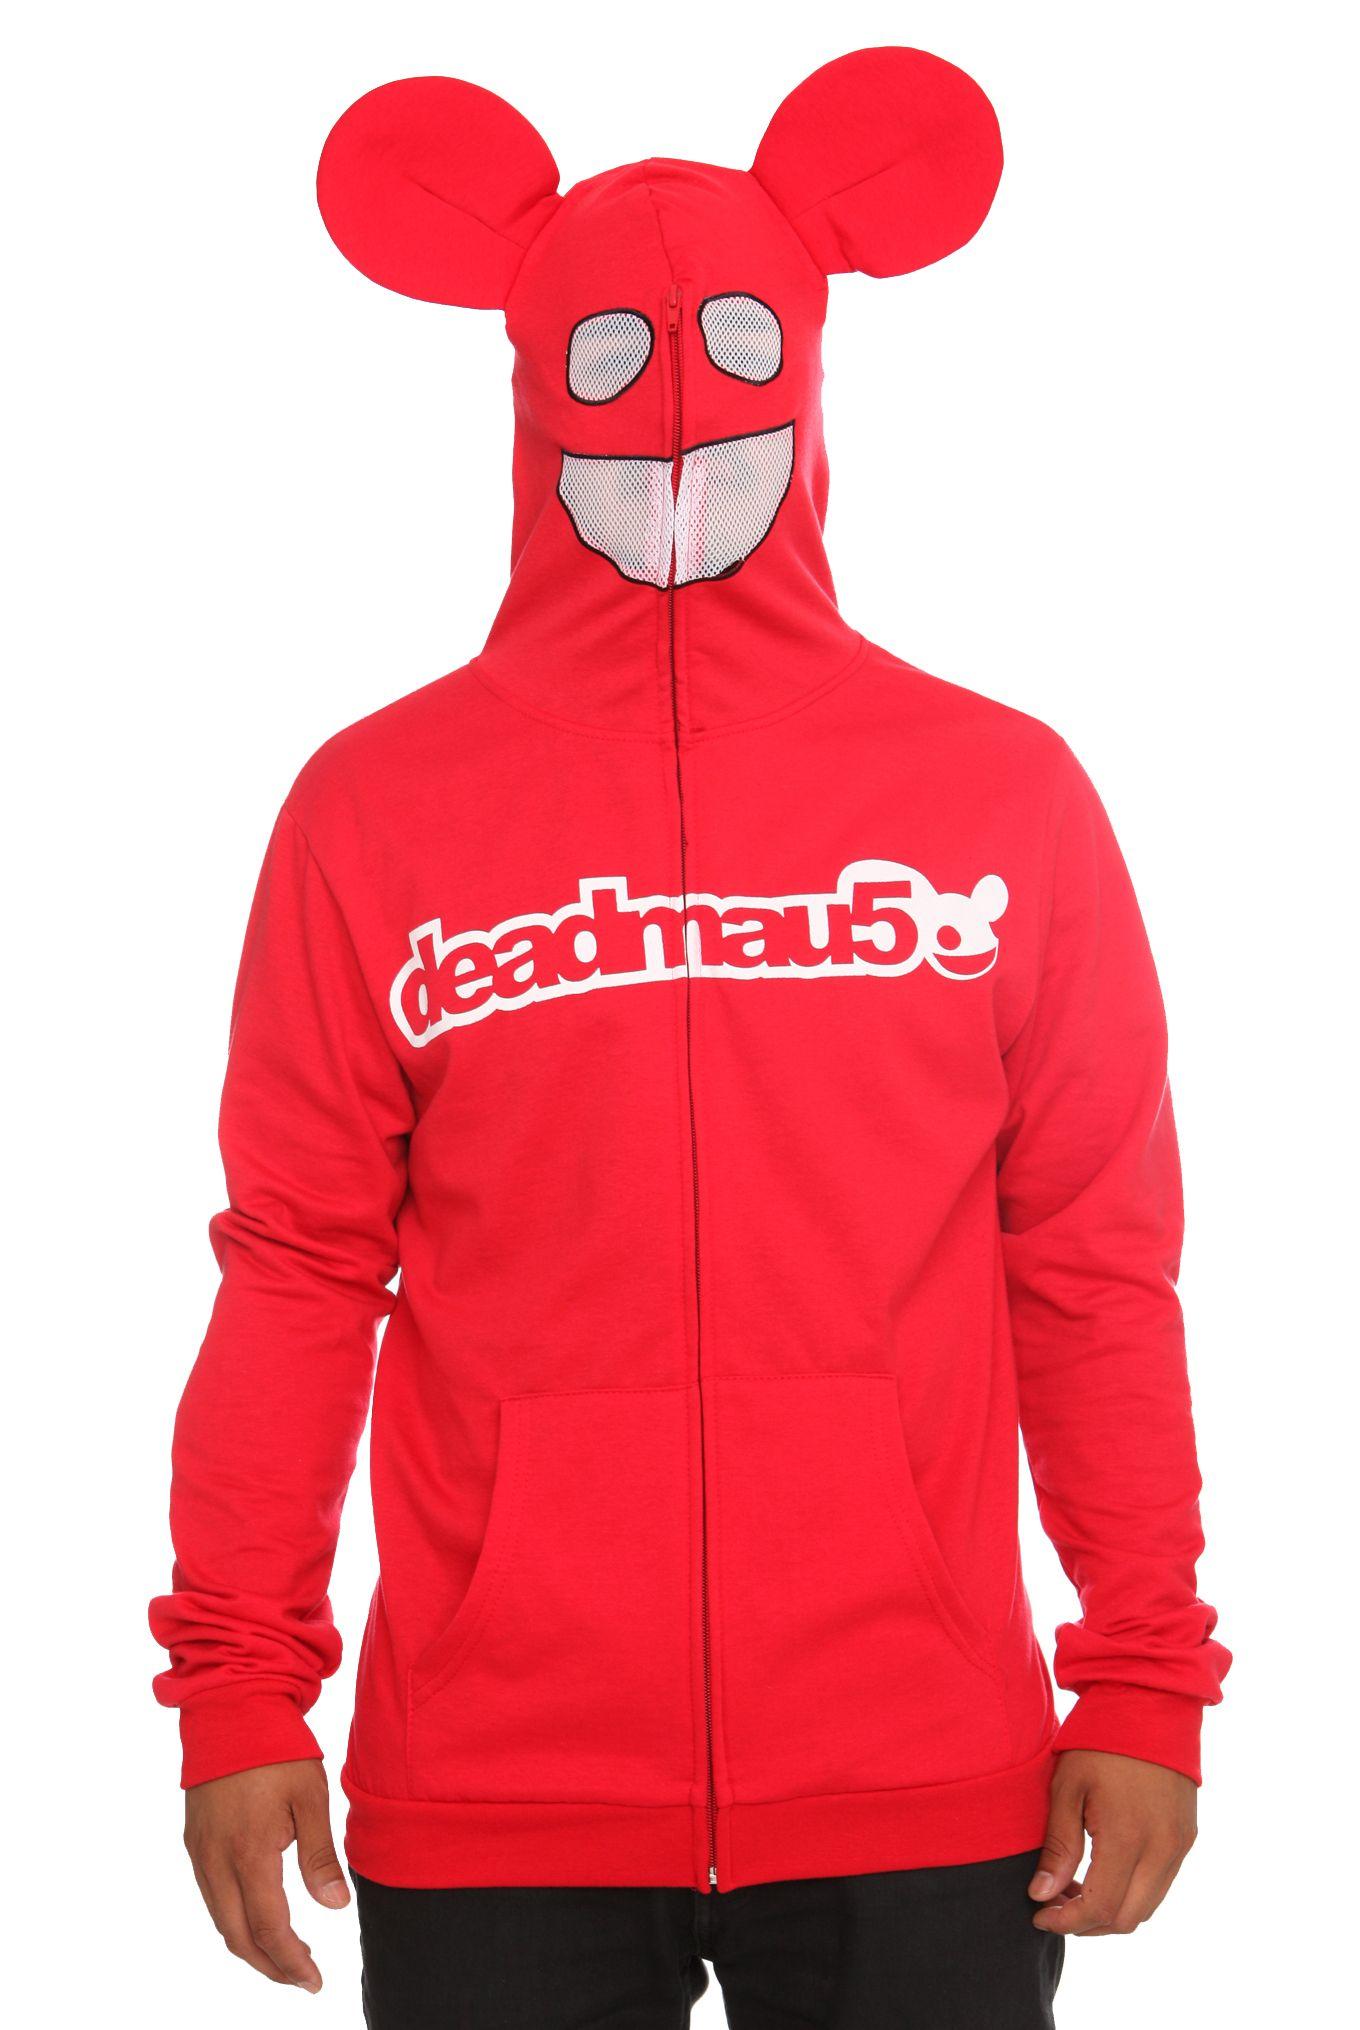 Deadmau5 Red Zip Up Hoodie Mouse Ears Mesh Mask Covers Face Mens Size S Deadmau5 Red Zip Up Hoodie Mouse Ears Hoodies Full Zip Hoodie Hoodie Halloween Costumes